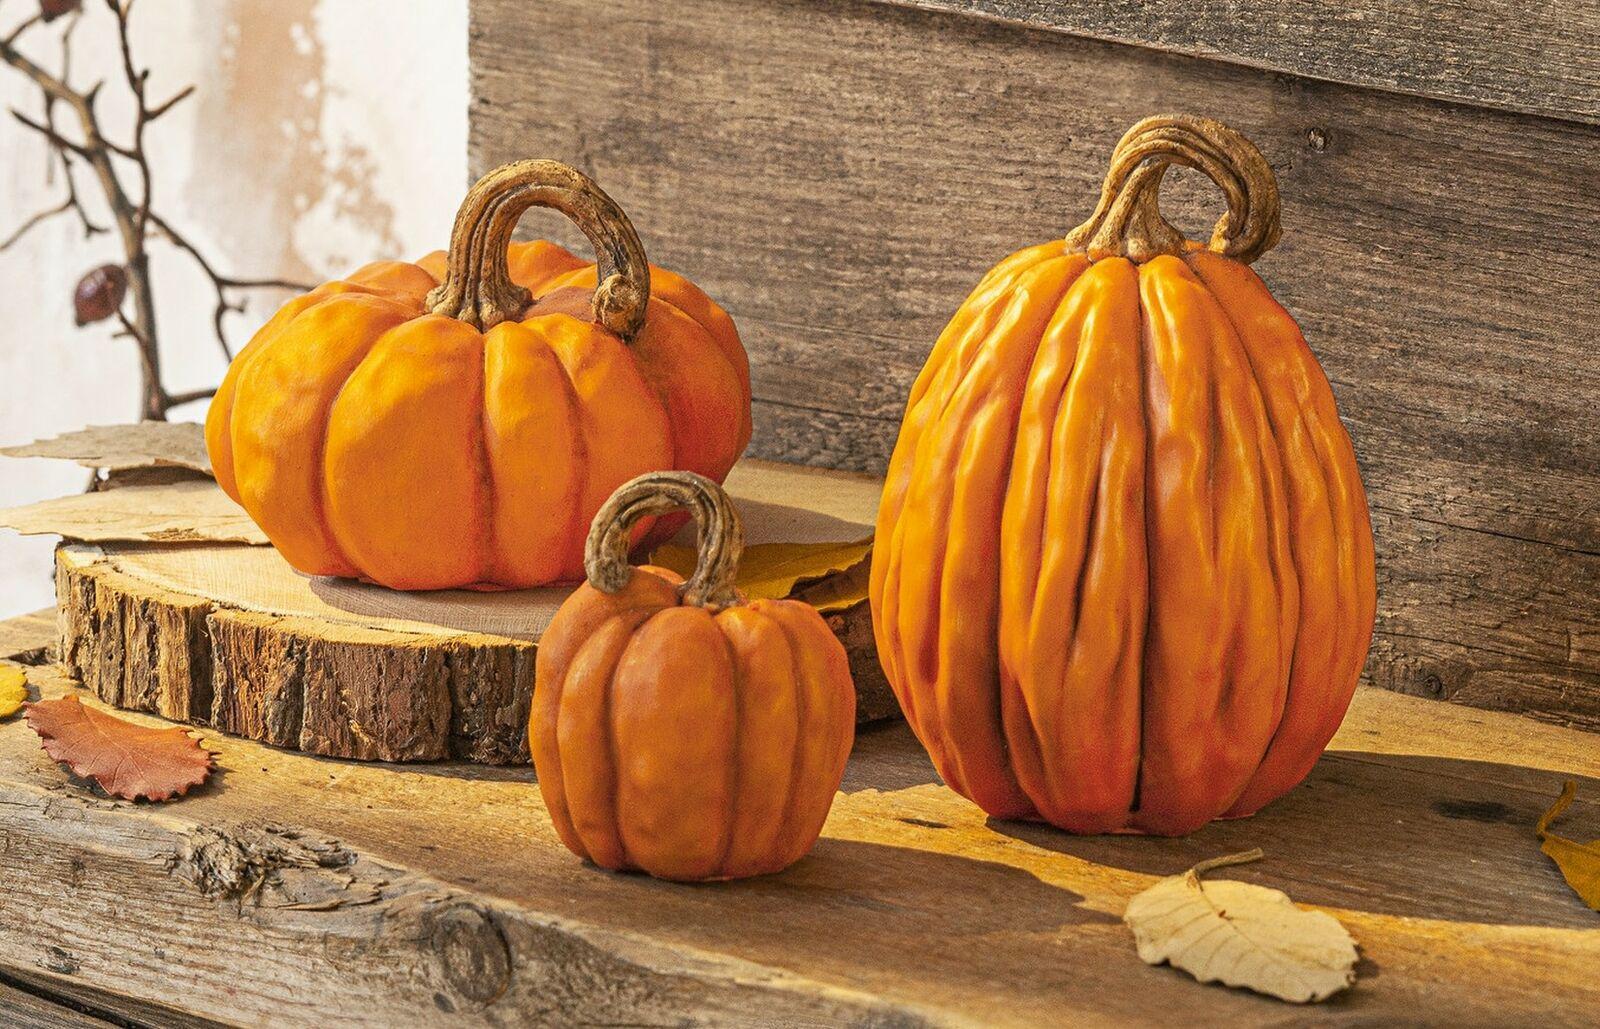 3 Deko Kurbisse Orange Detail Getreu Herbst Halloween Kurbis Figur Kaufen Bei Come4buy Gmbh